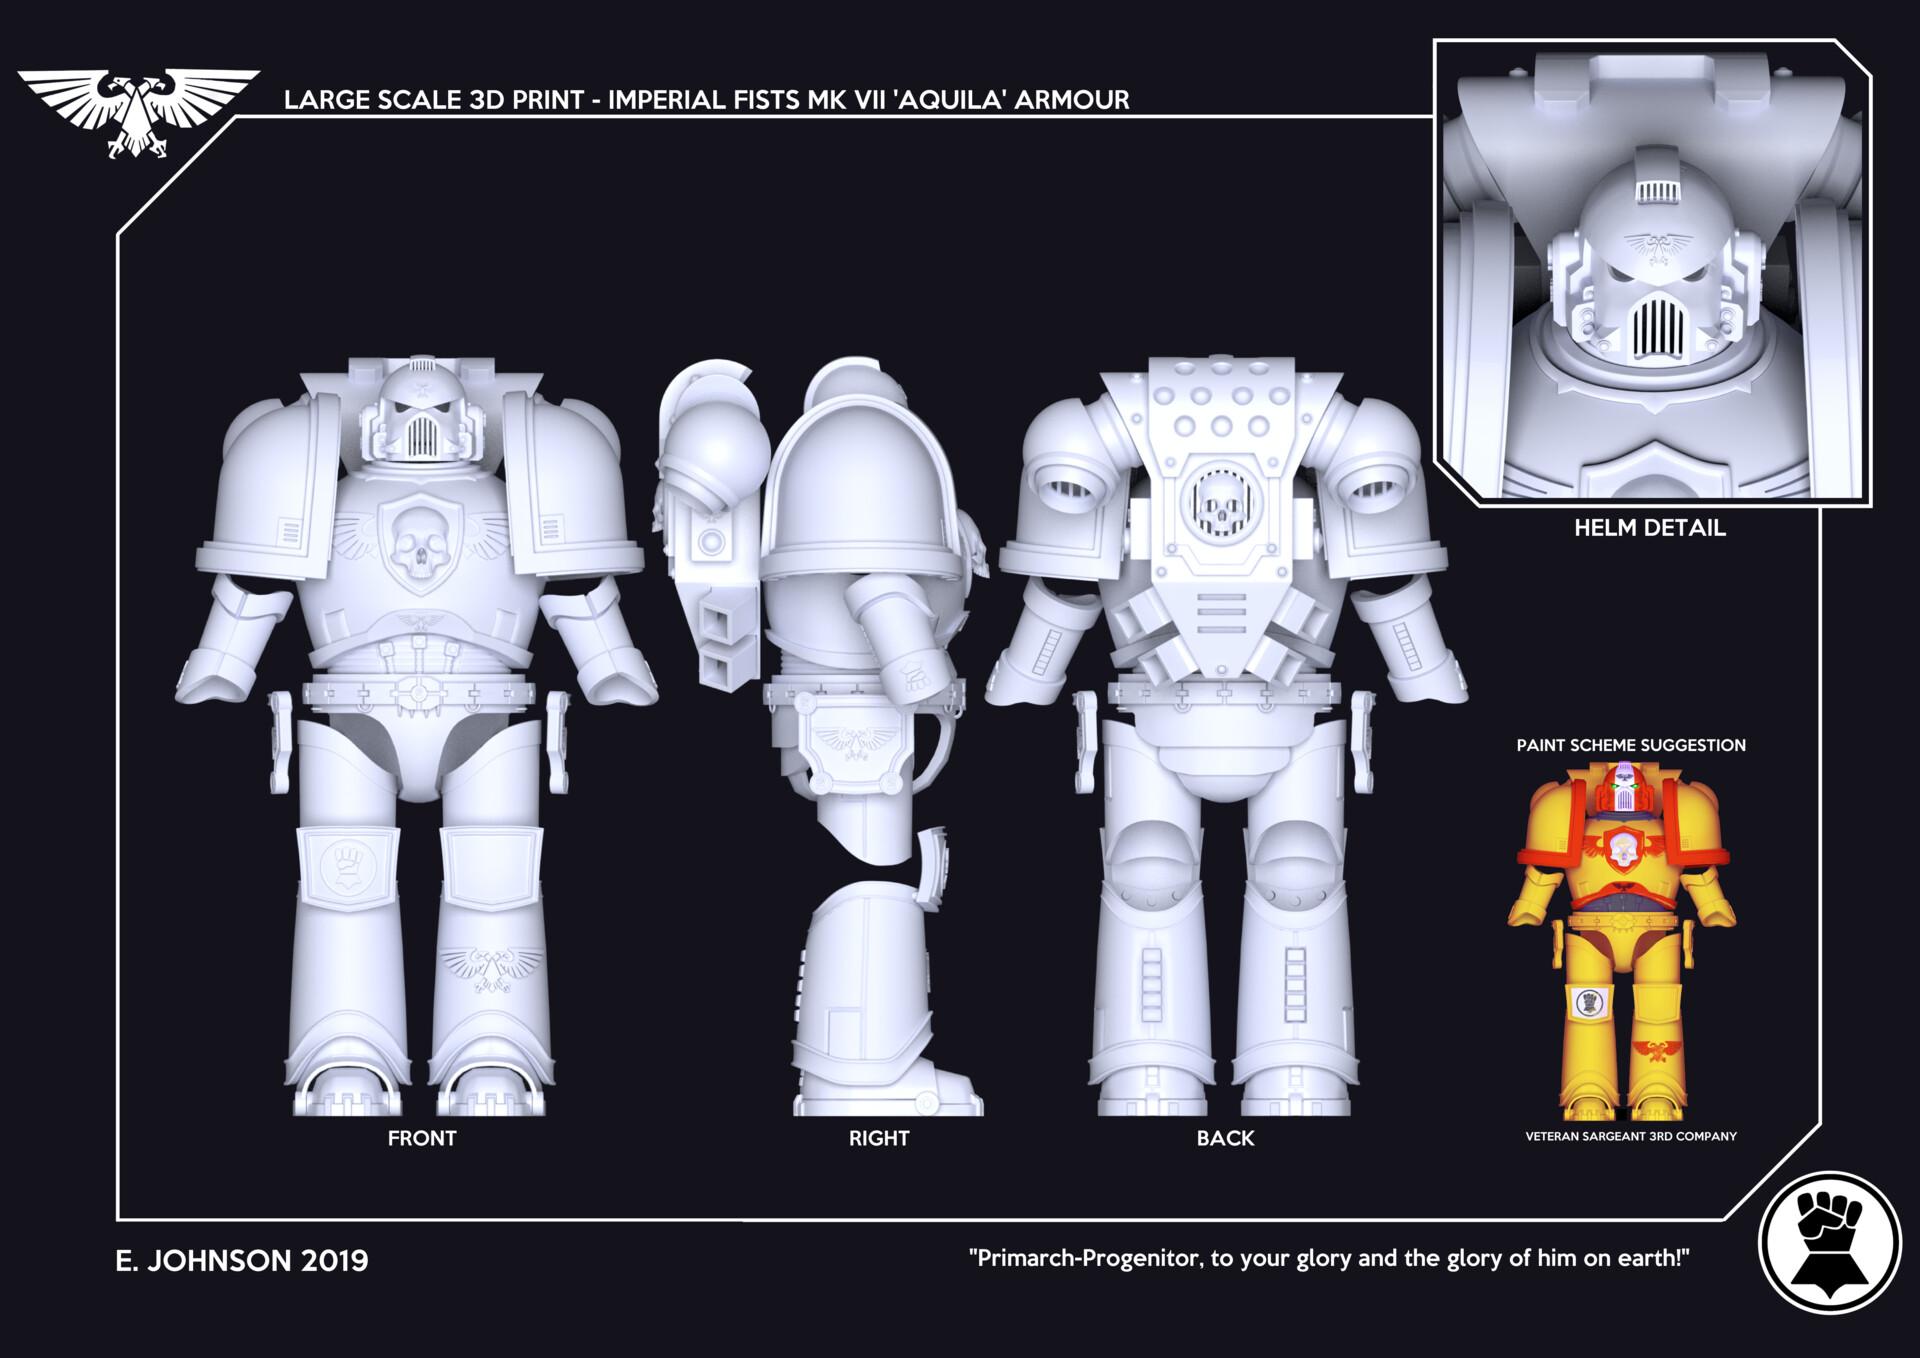 Em Johnson - Space Marine Armour - Large Scale 3D Print Project